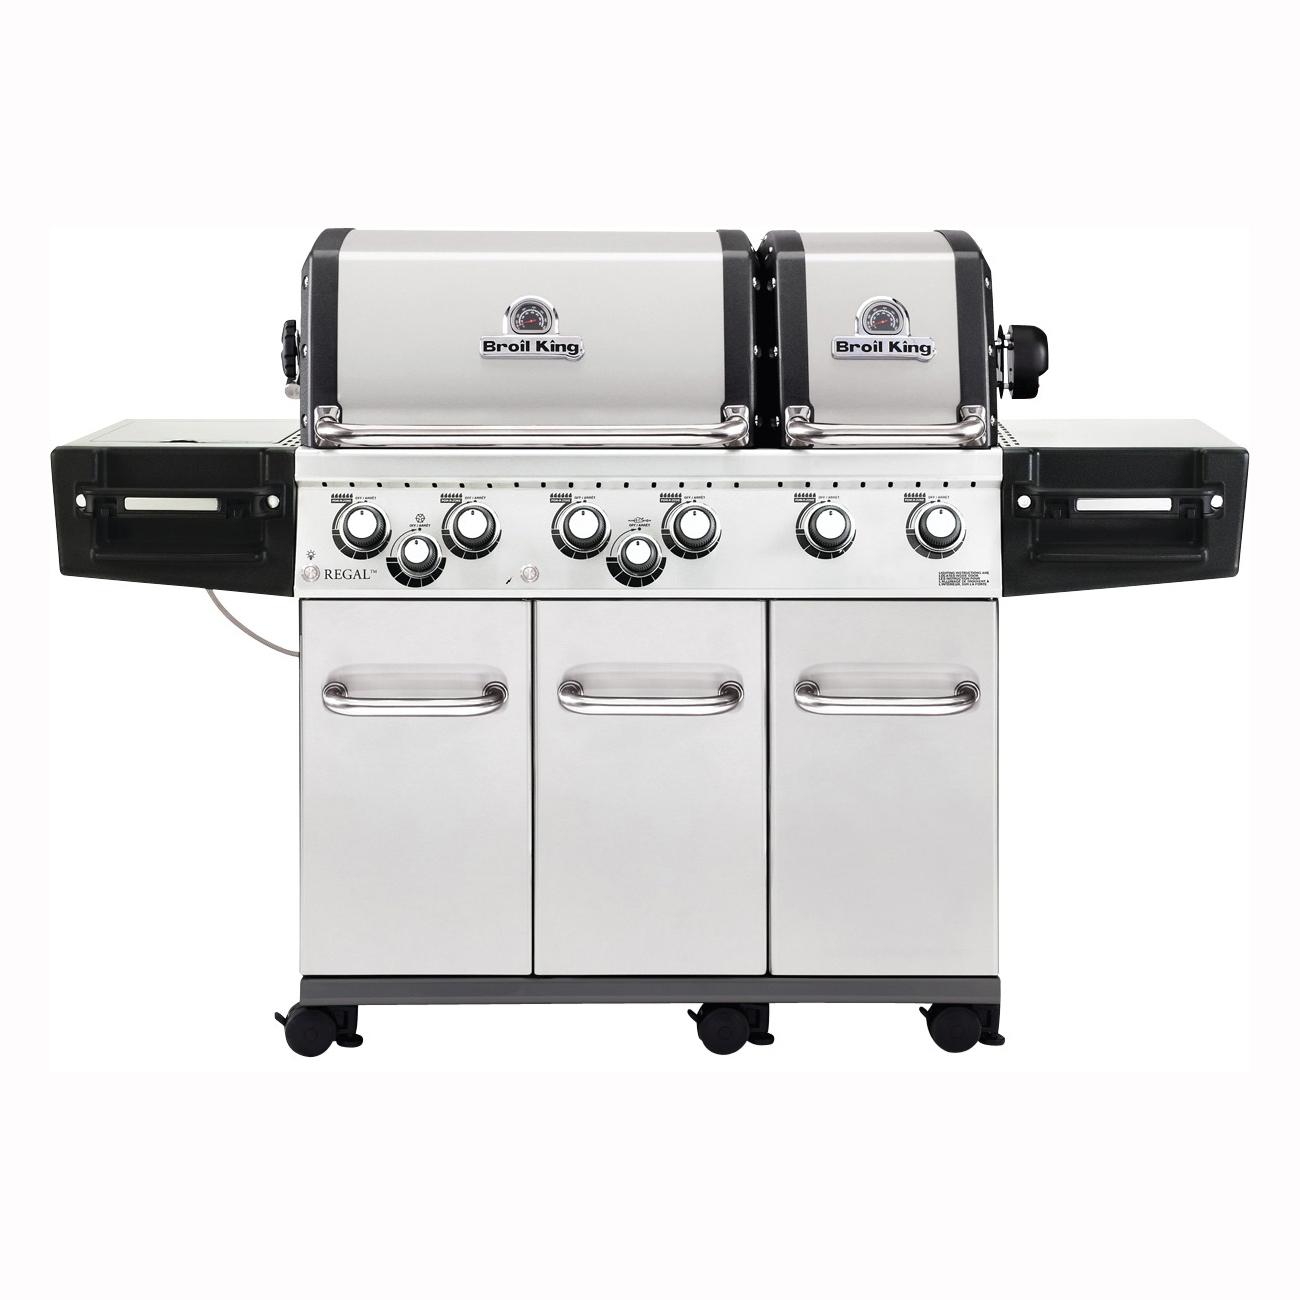 Picture of Broil King Regal 957344 Gas Grill, 60000 Btu/hr BTU, Liquid Propane, 6 -Burner, 250 sq-in Primary Cooking Surface